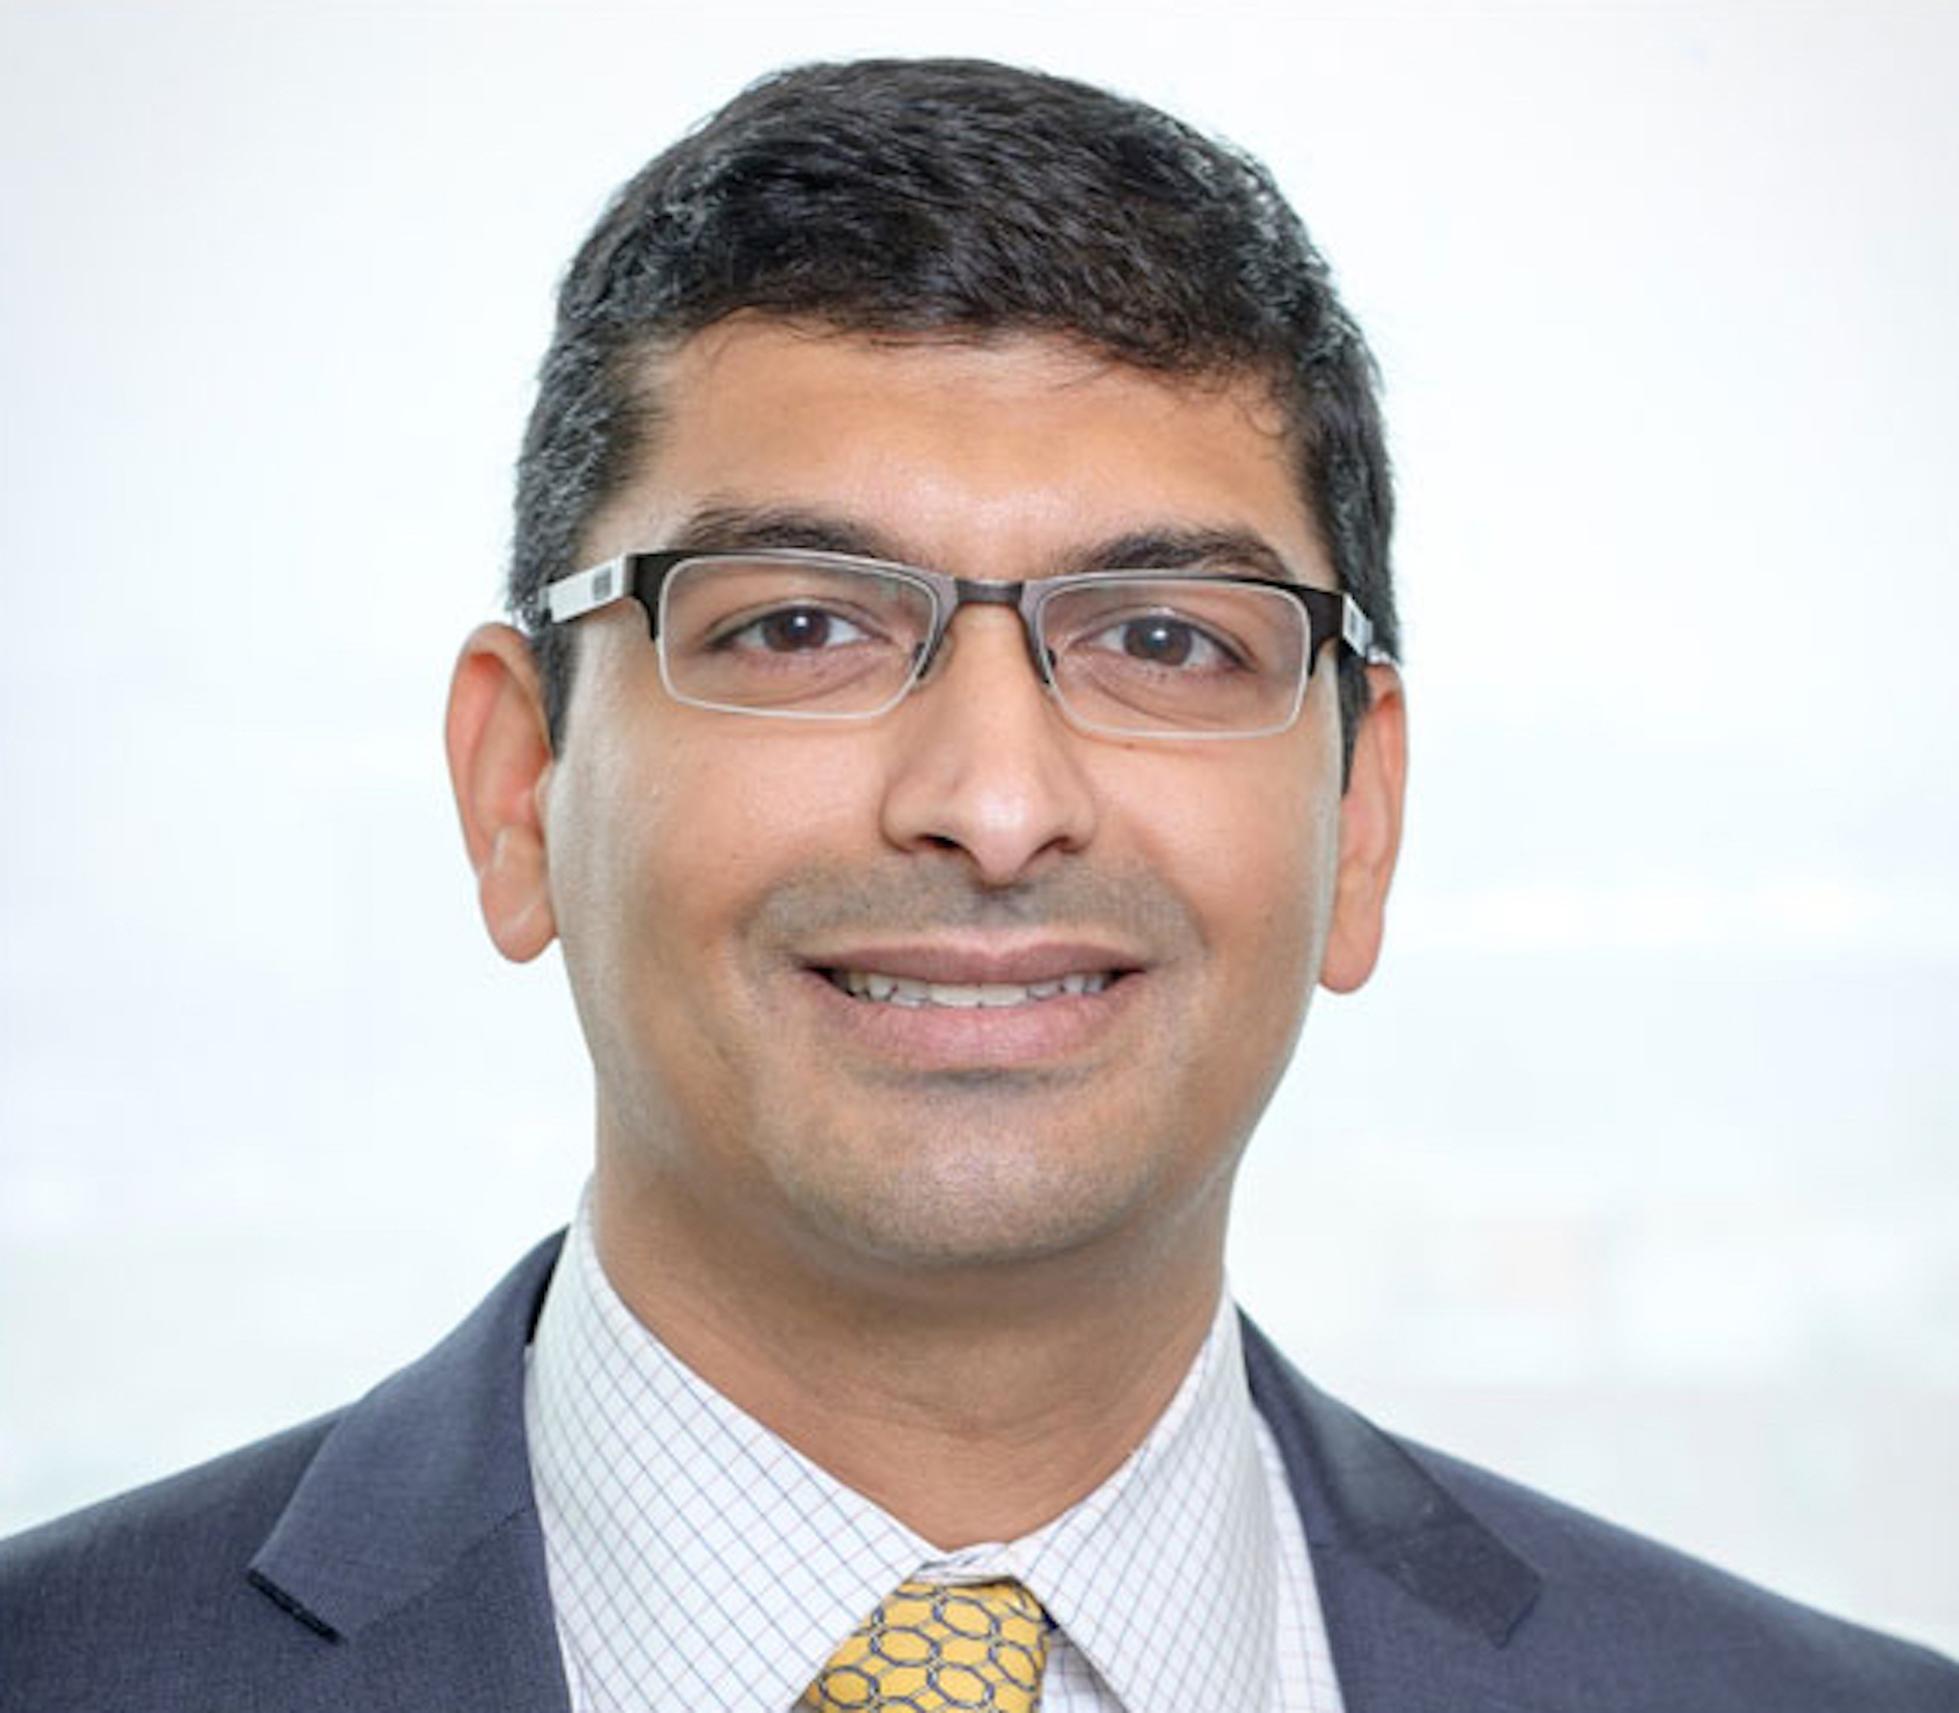 Maulik Majmudar, chief medical officer, Biofourmis.